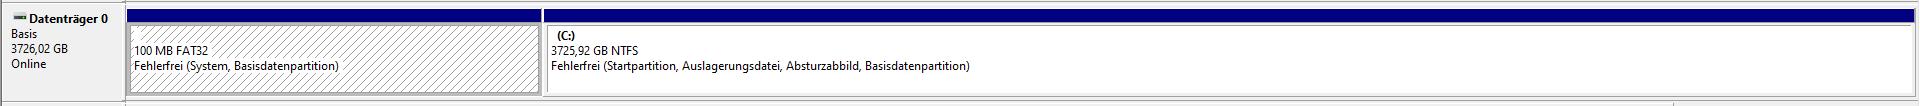 Screenshot_521.png